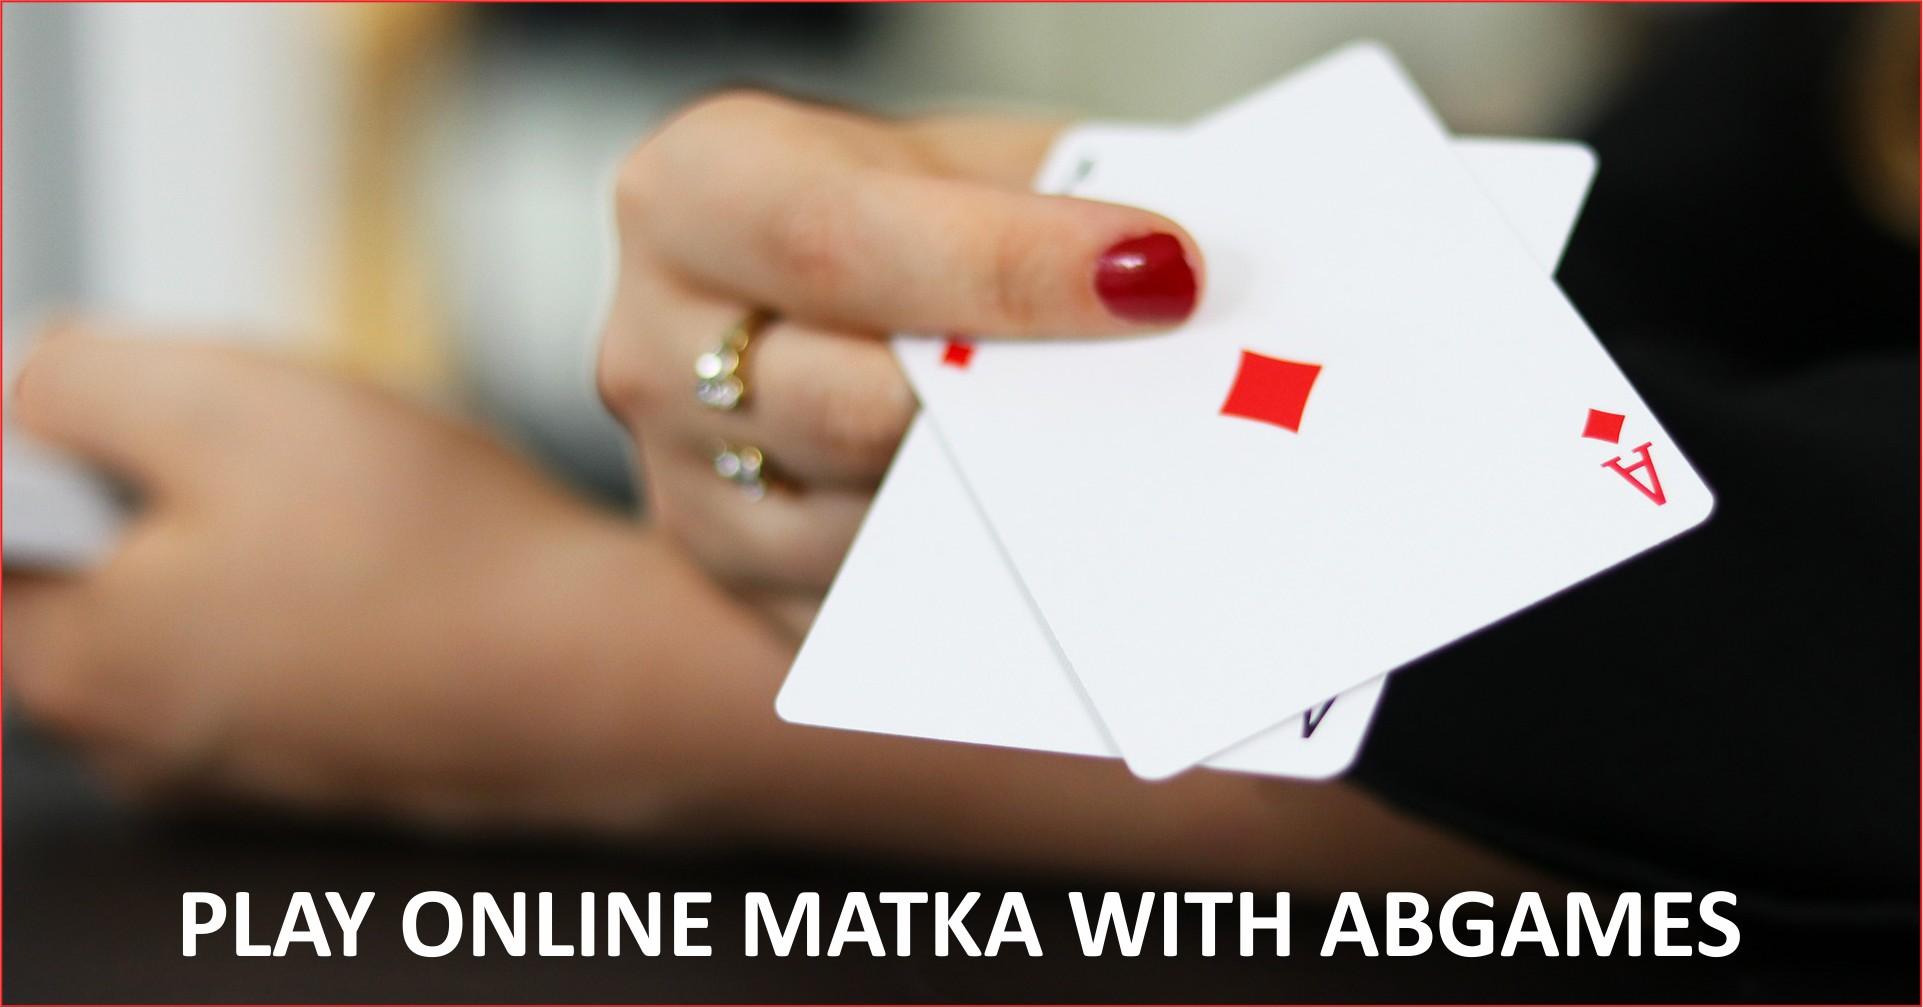 Play Online Matka | Kalyan Matka Tricks | ABGames Matka Online